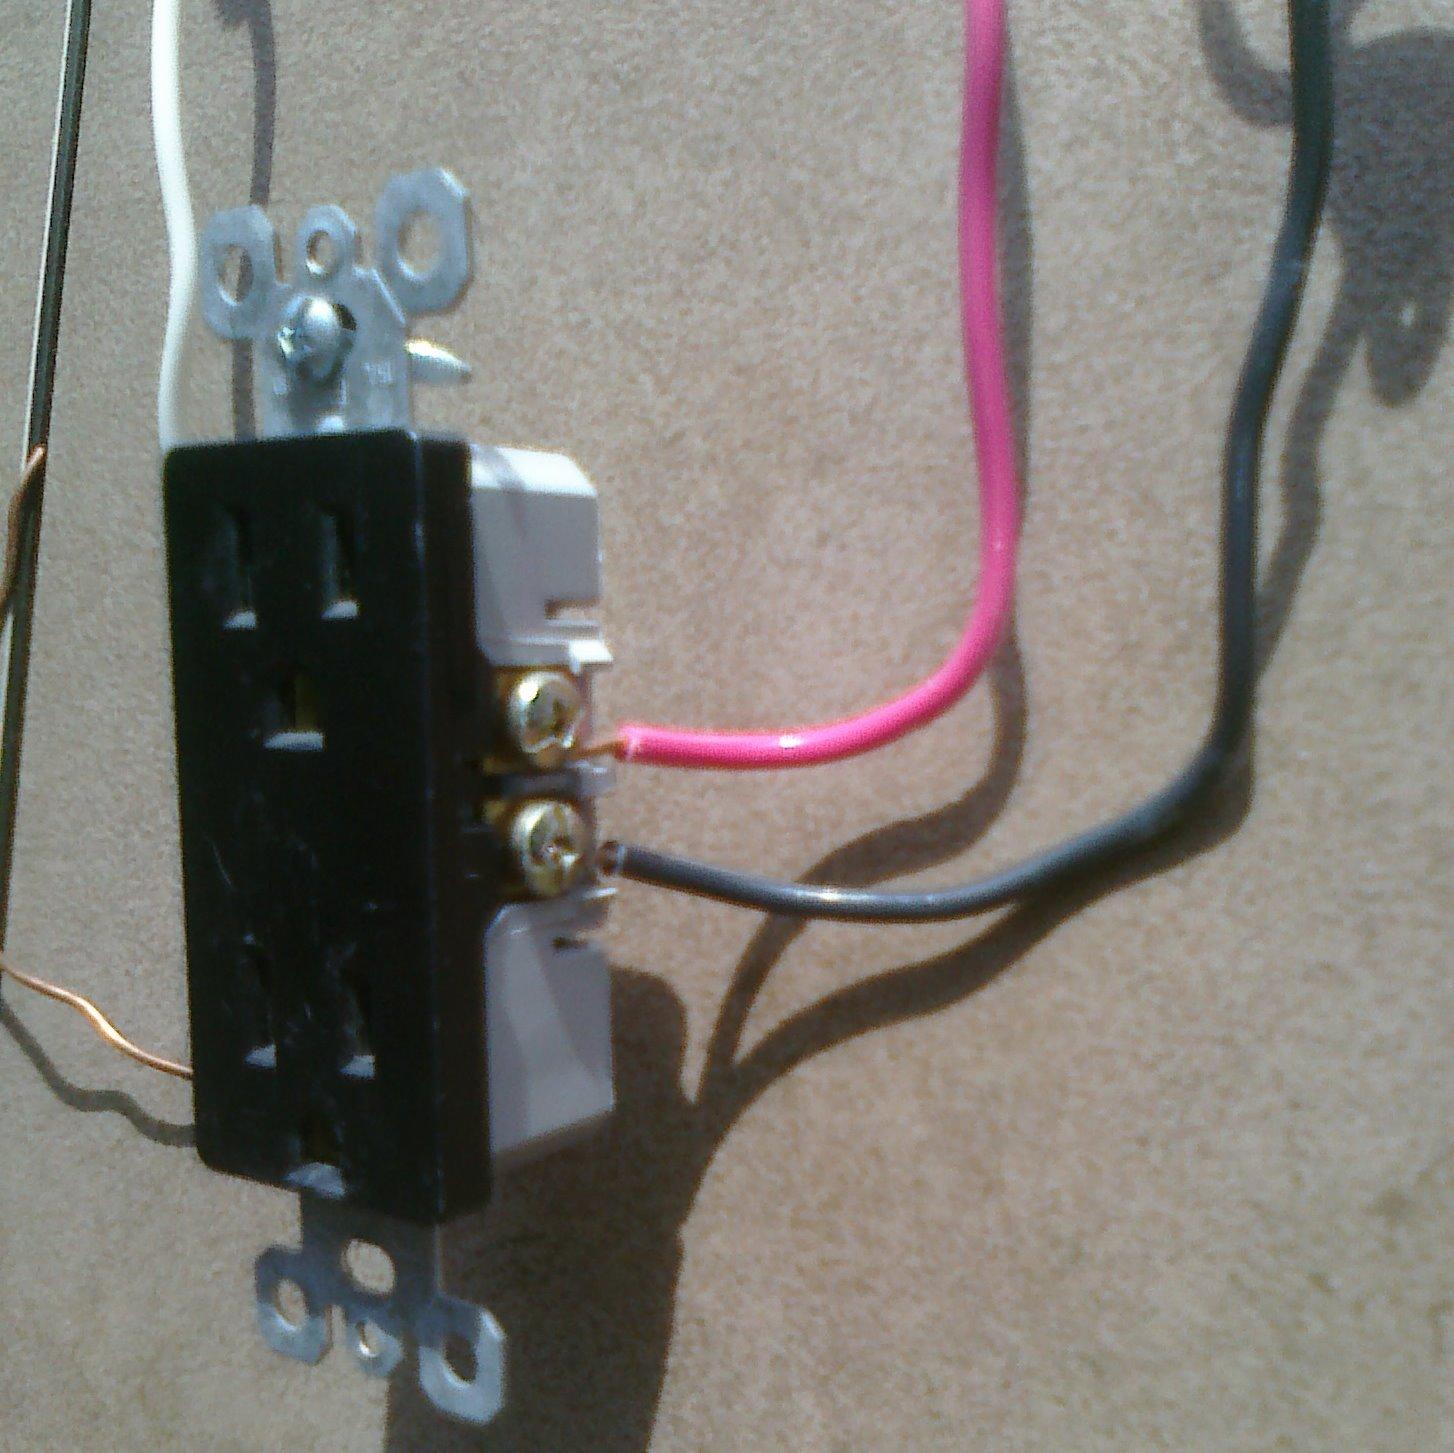 240v 3 prong plug wiring diagramhight resolution of kitchen plug wiring wiring diagrams scematic 4 prong plug wiring diagram 2pole 3